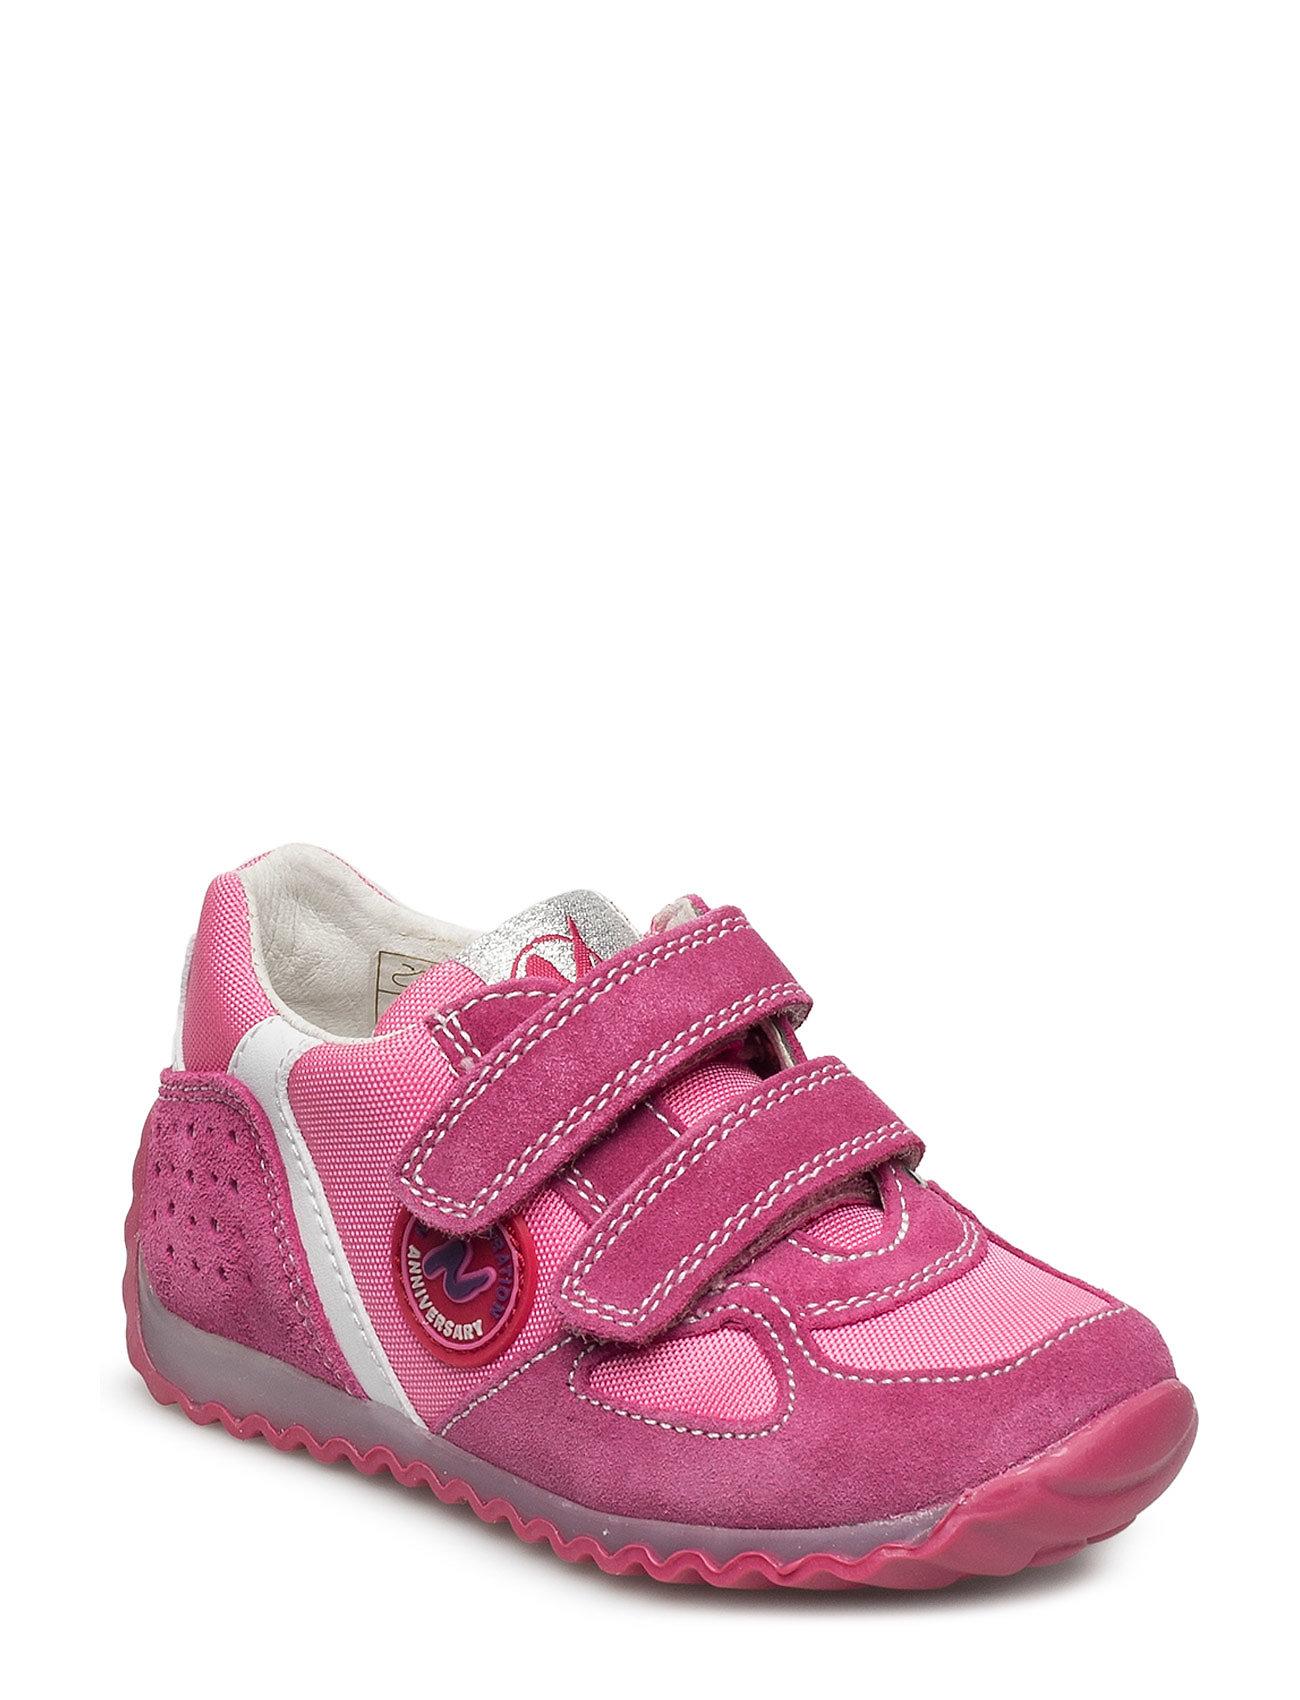 Naturino Isao Vl. Naturino Sko & Sneakers til Børn i